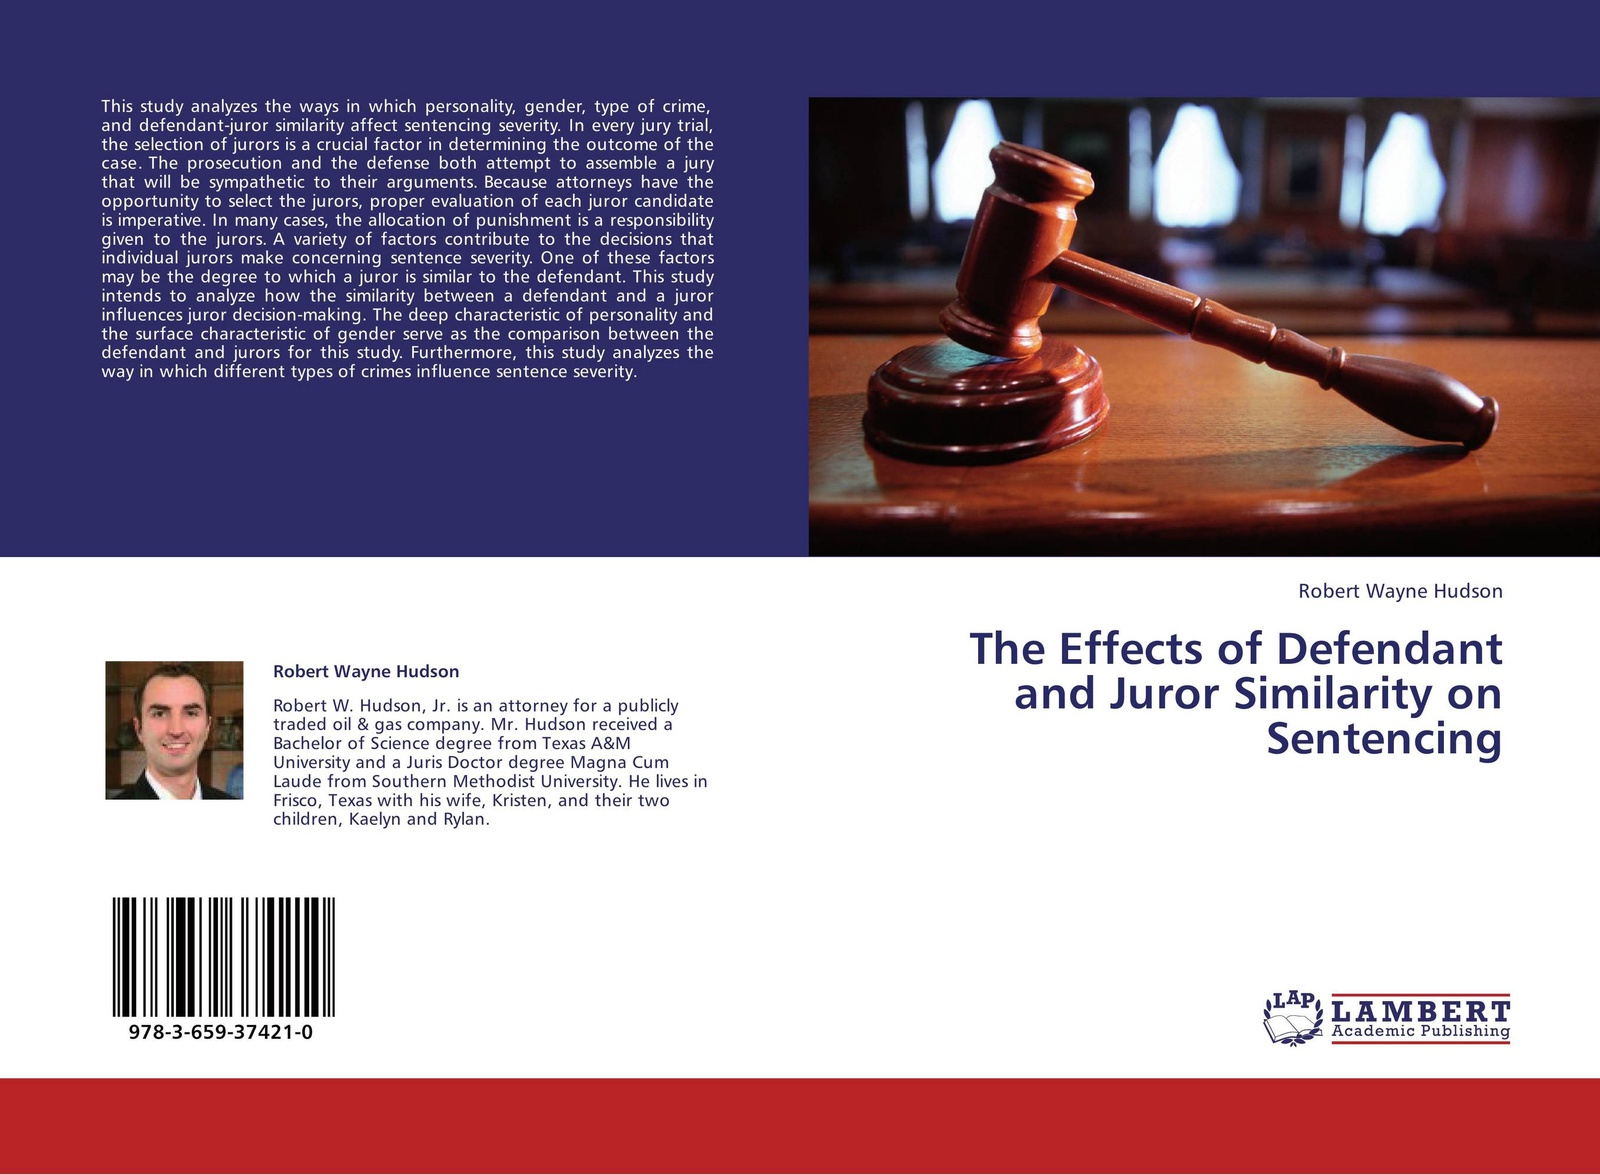 Robert Wayne Hudson The Effects of Defendant and Juror Similarity on Sentencing стоимость